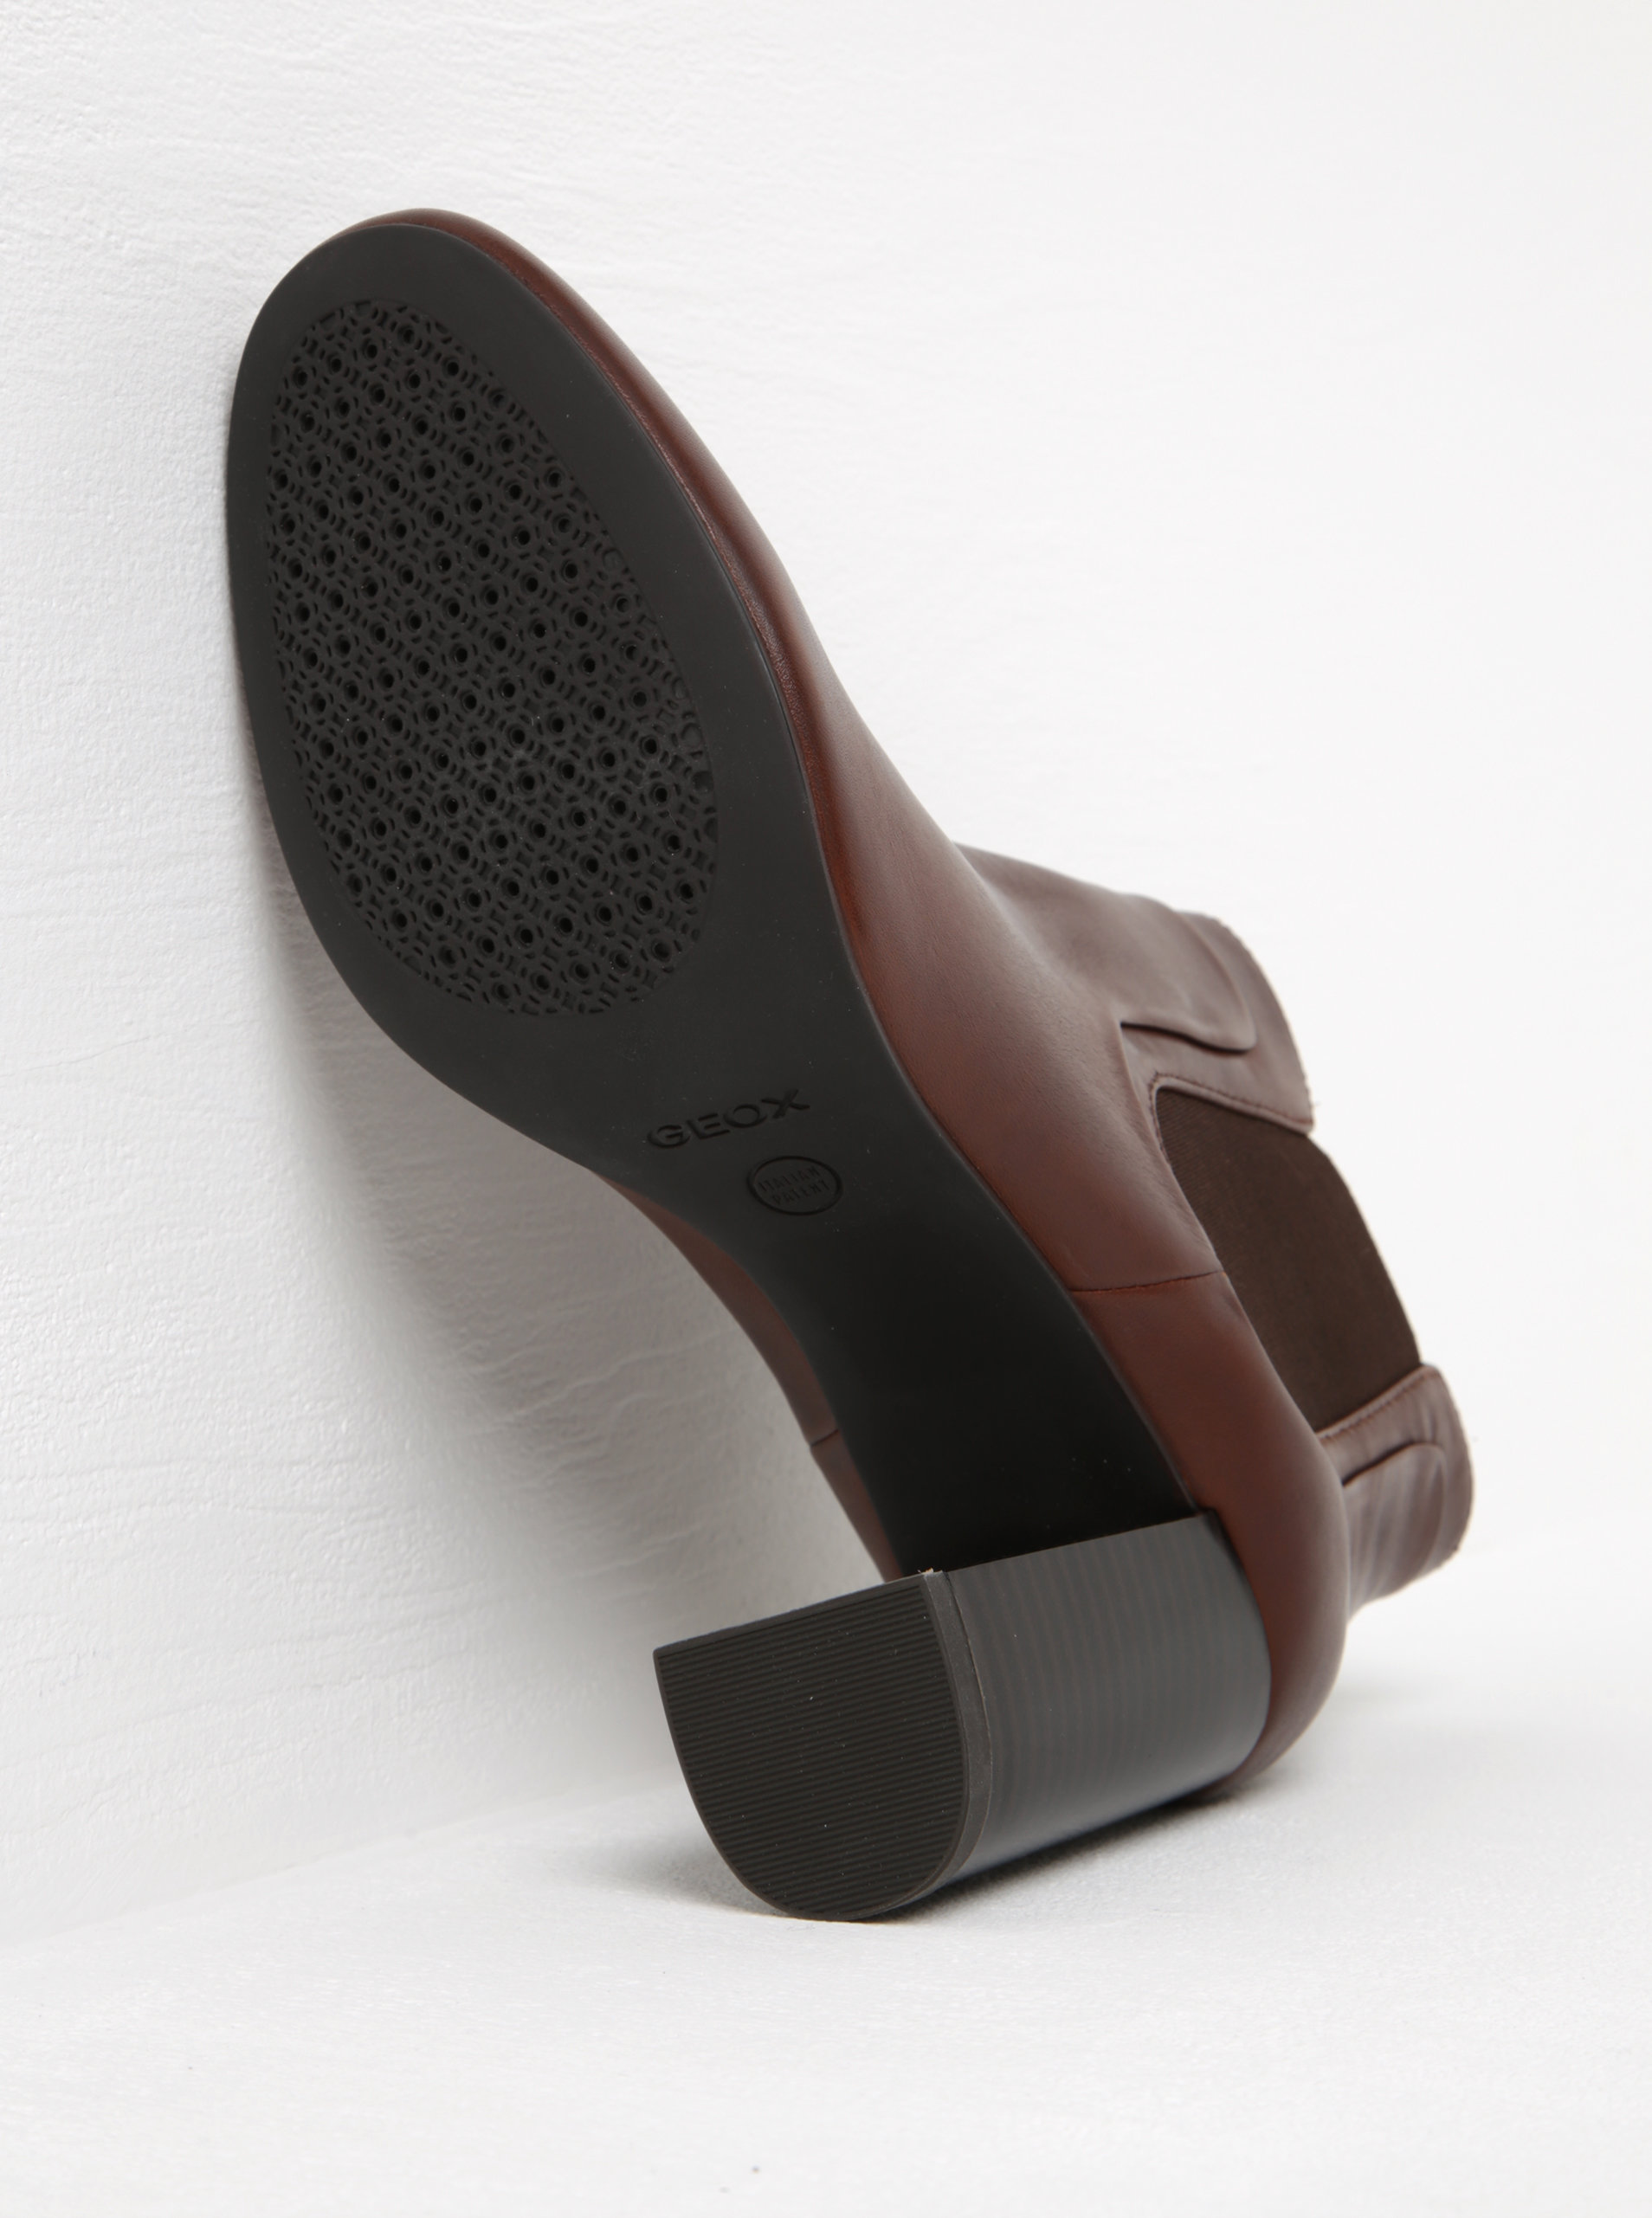 31345e0d972a Hnedé dámske kožené chelsea topánky na vysokom podpätku Geox Audalies ...